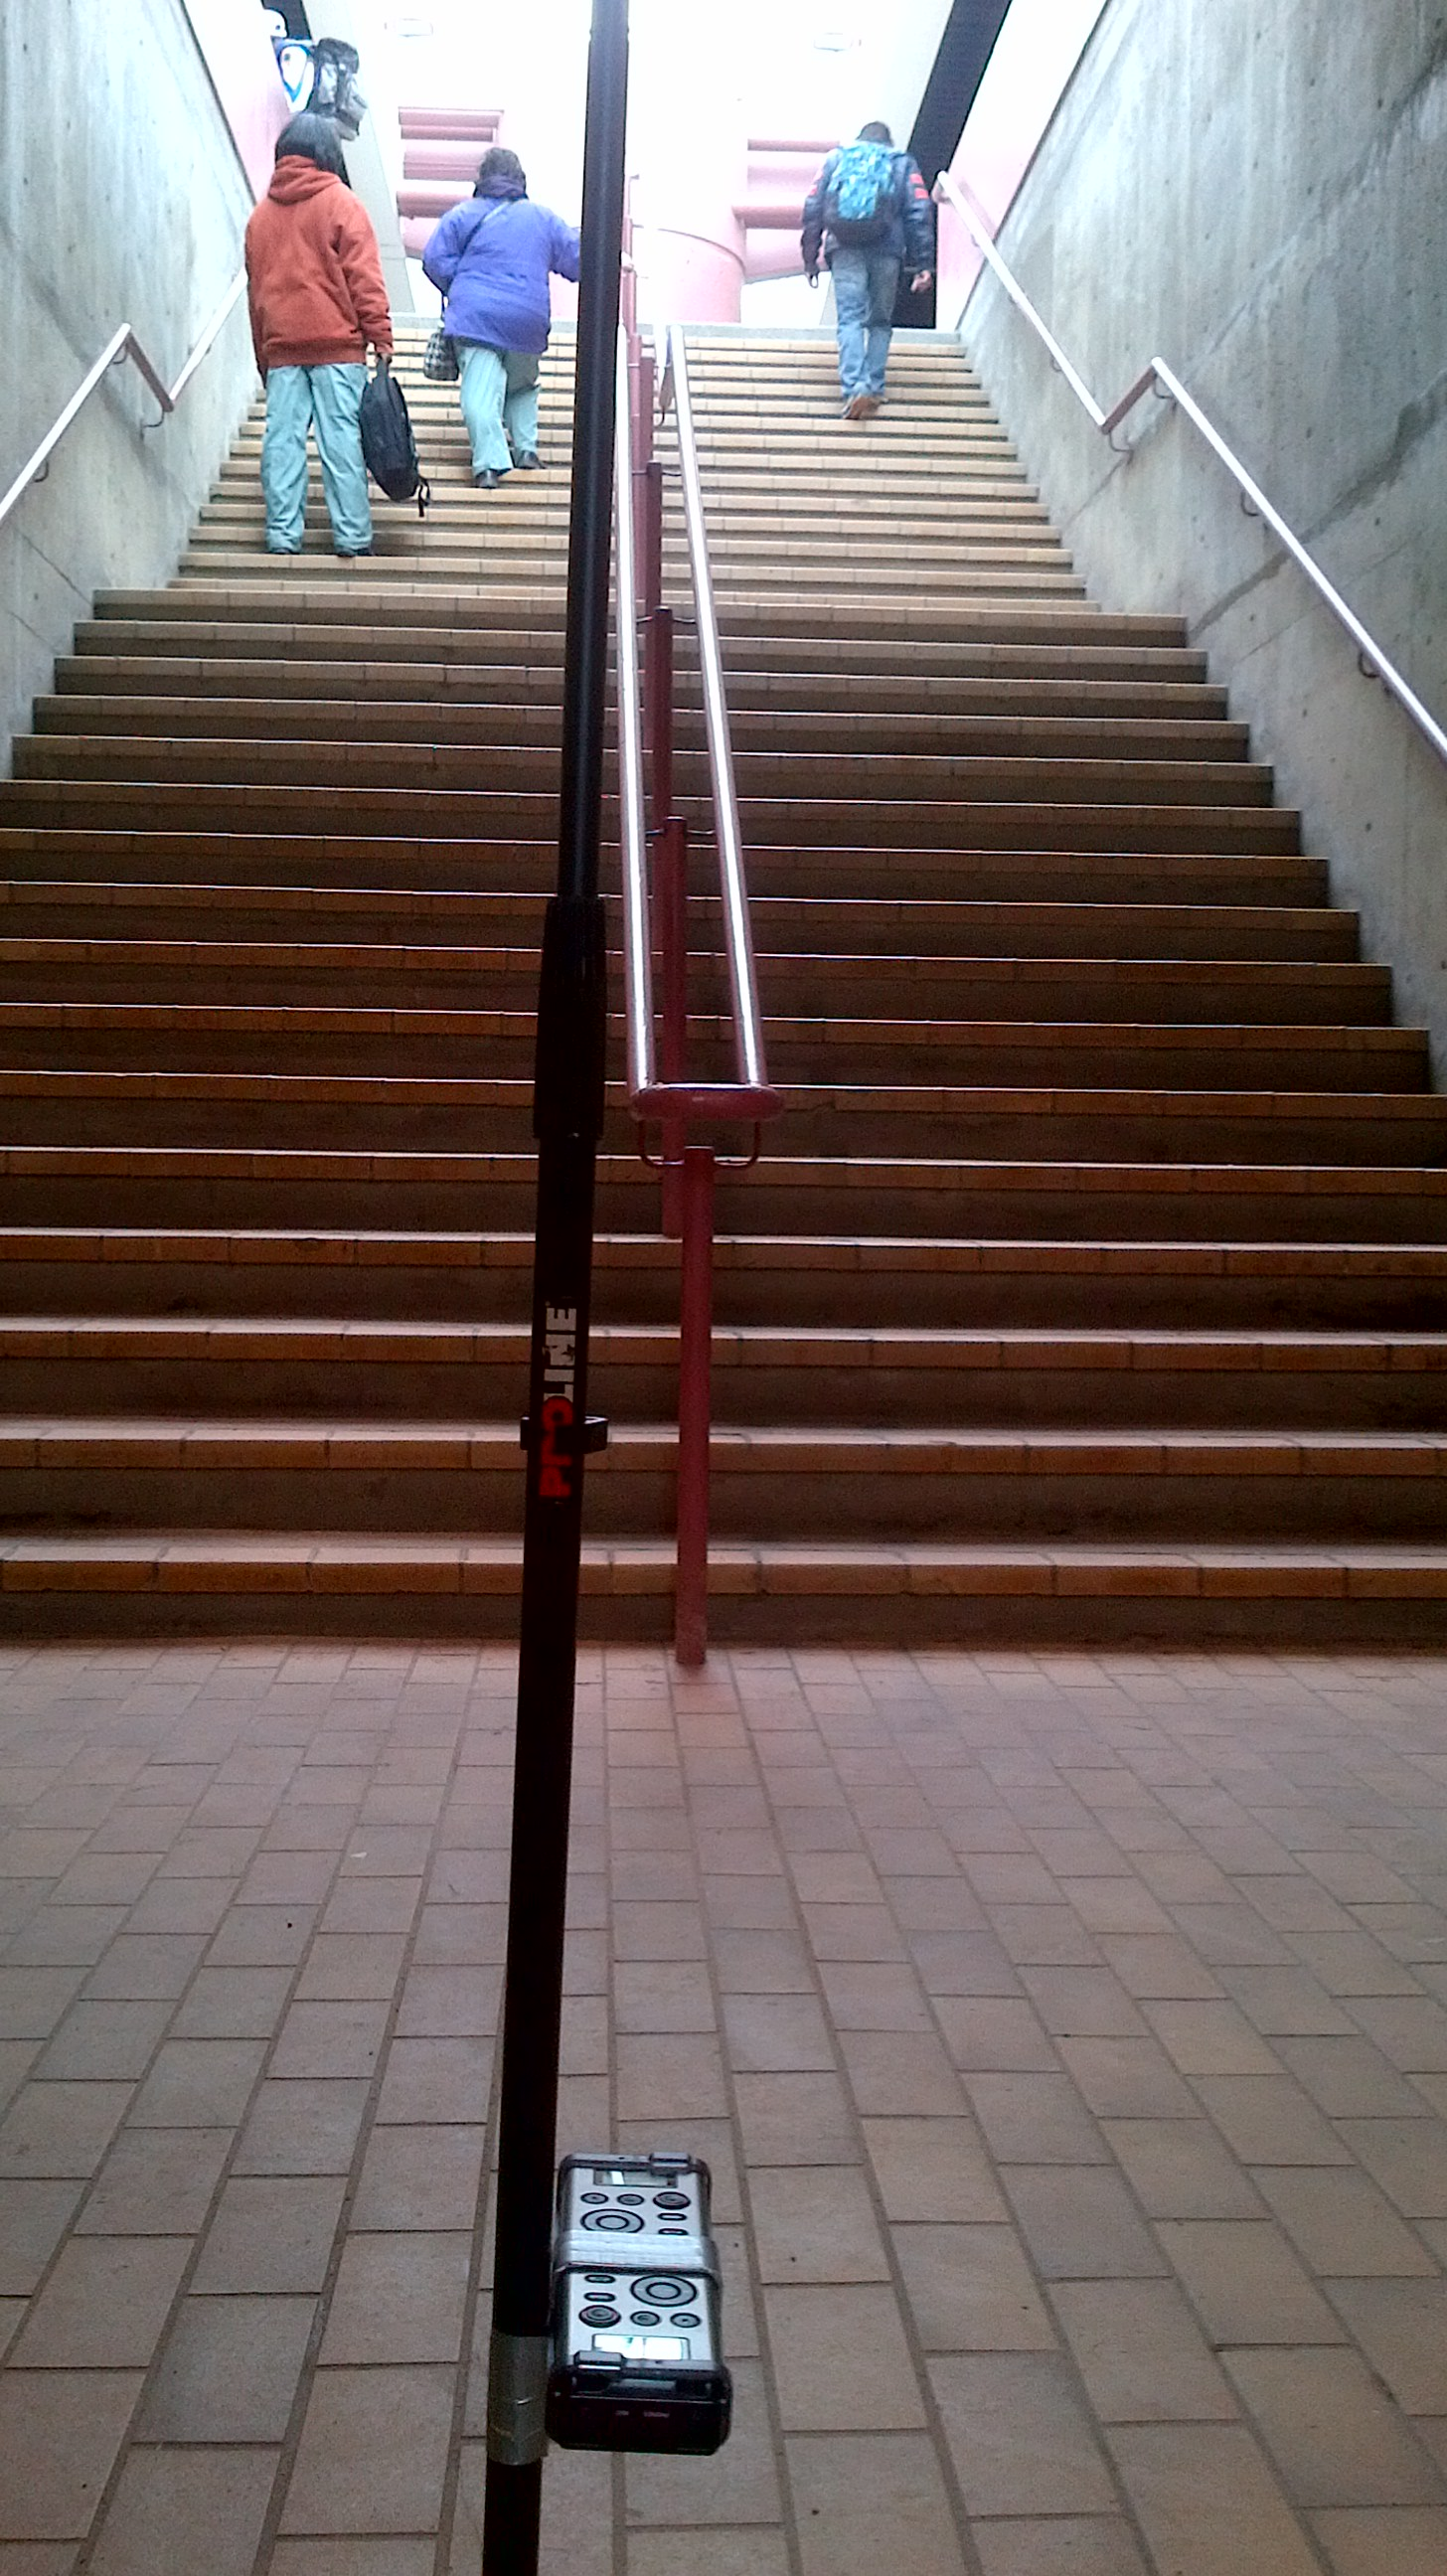 Octophonic Metro Station recording